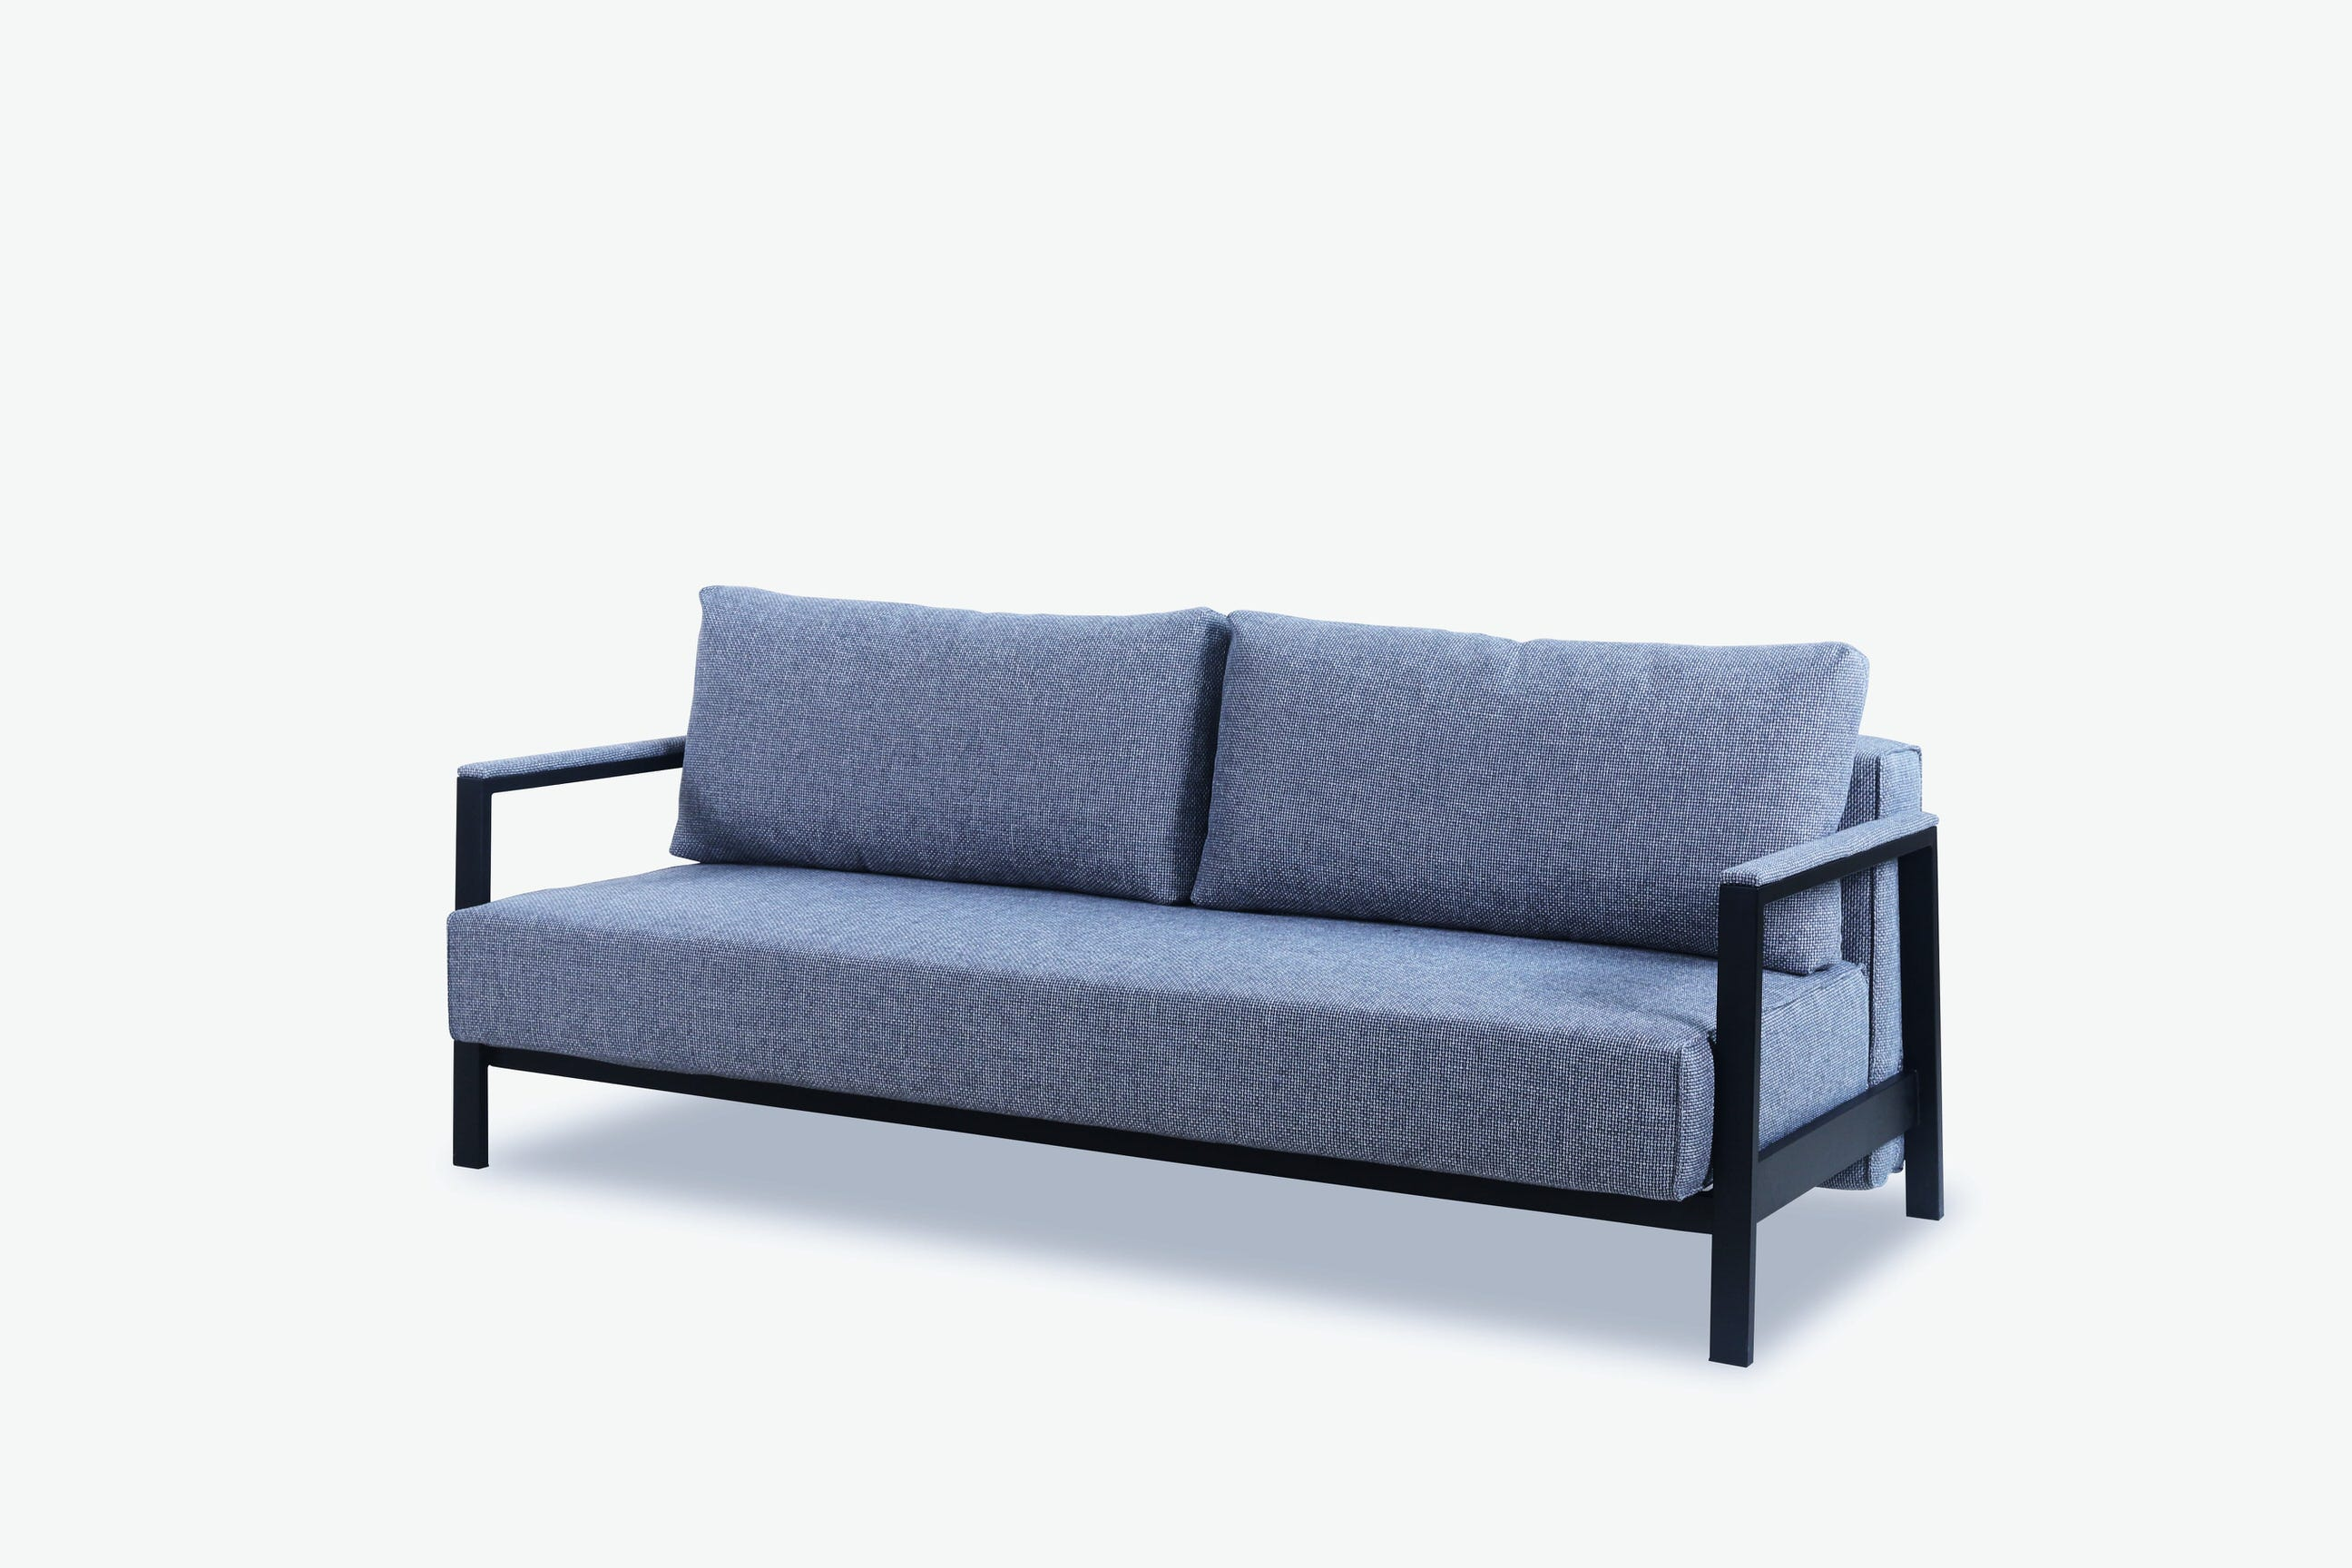 jensen lewis sleeper sofa price precio italiano natuzzi new bed model supplieranufacturers thesofa